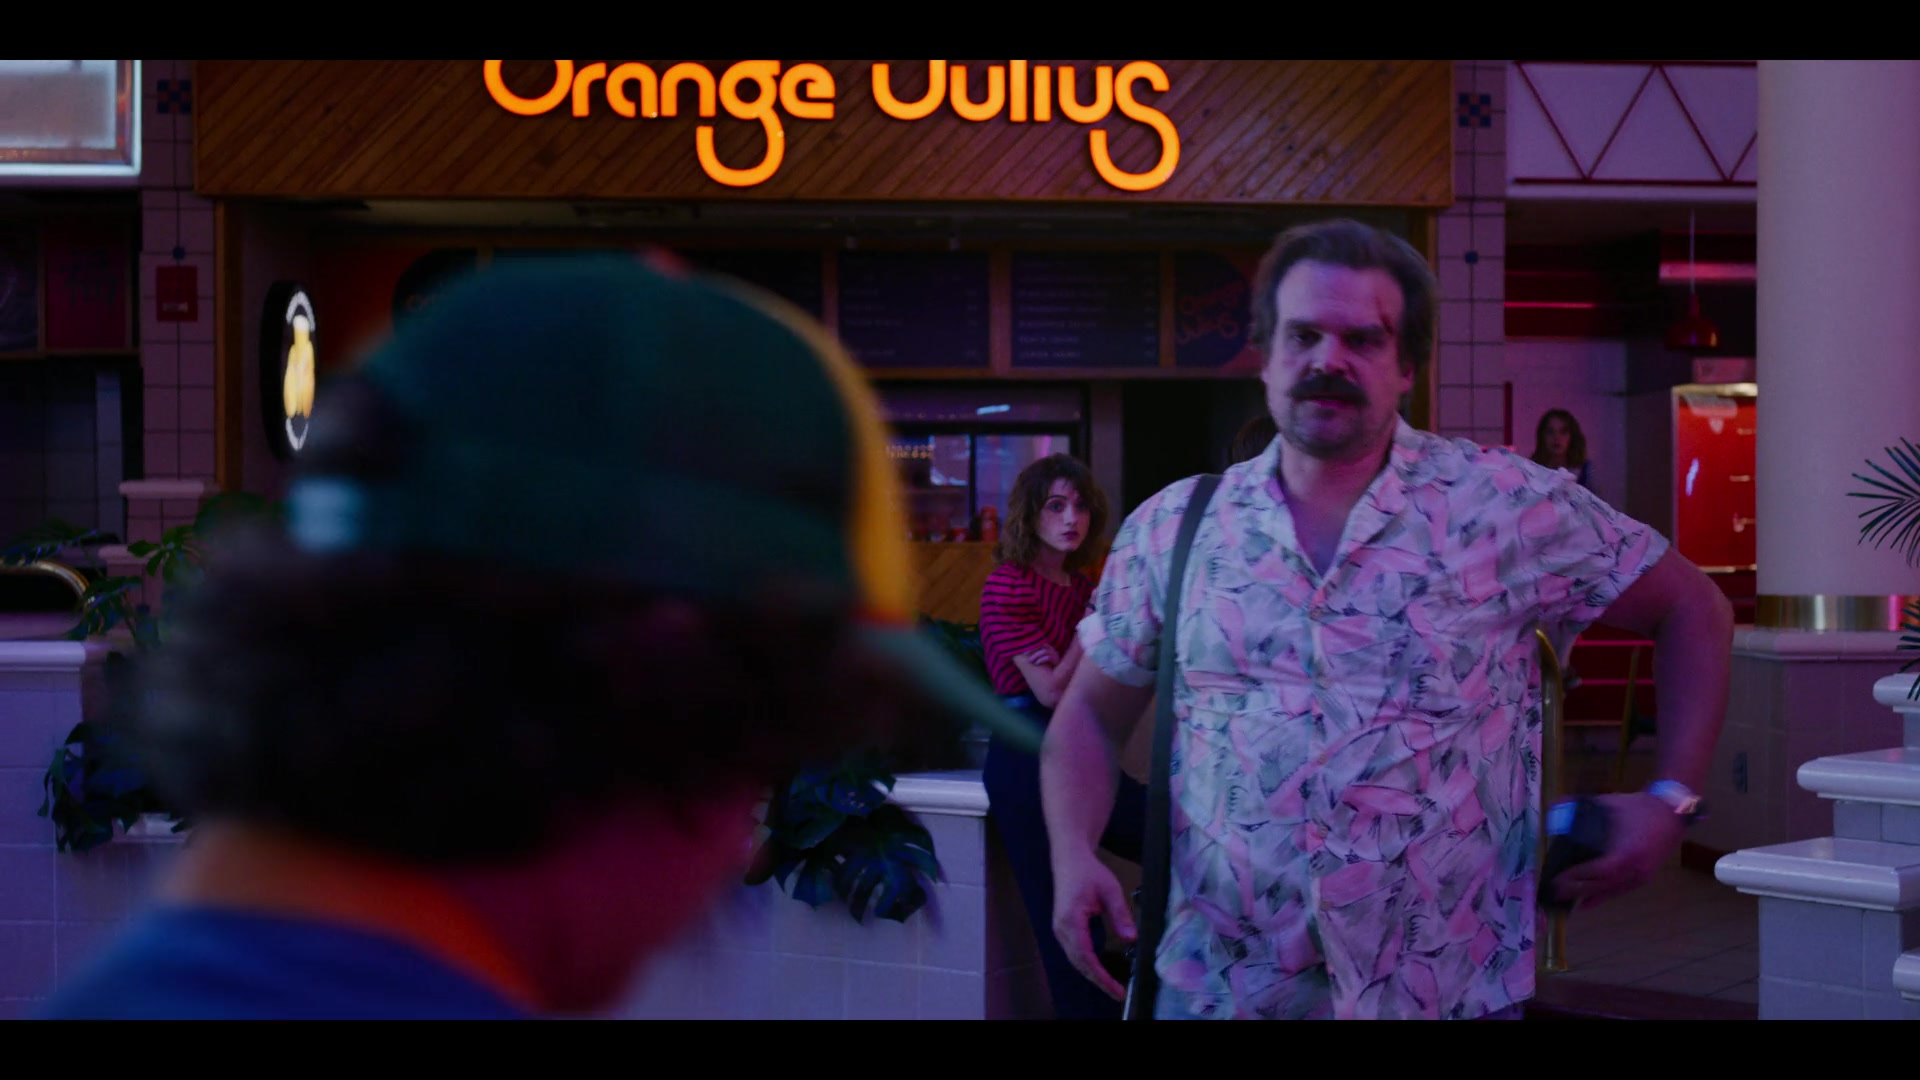 Orange Julius Fruit Drink Beverage Store in Stranger Things - Season